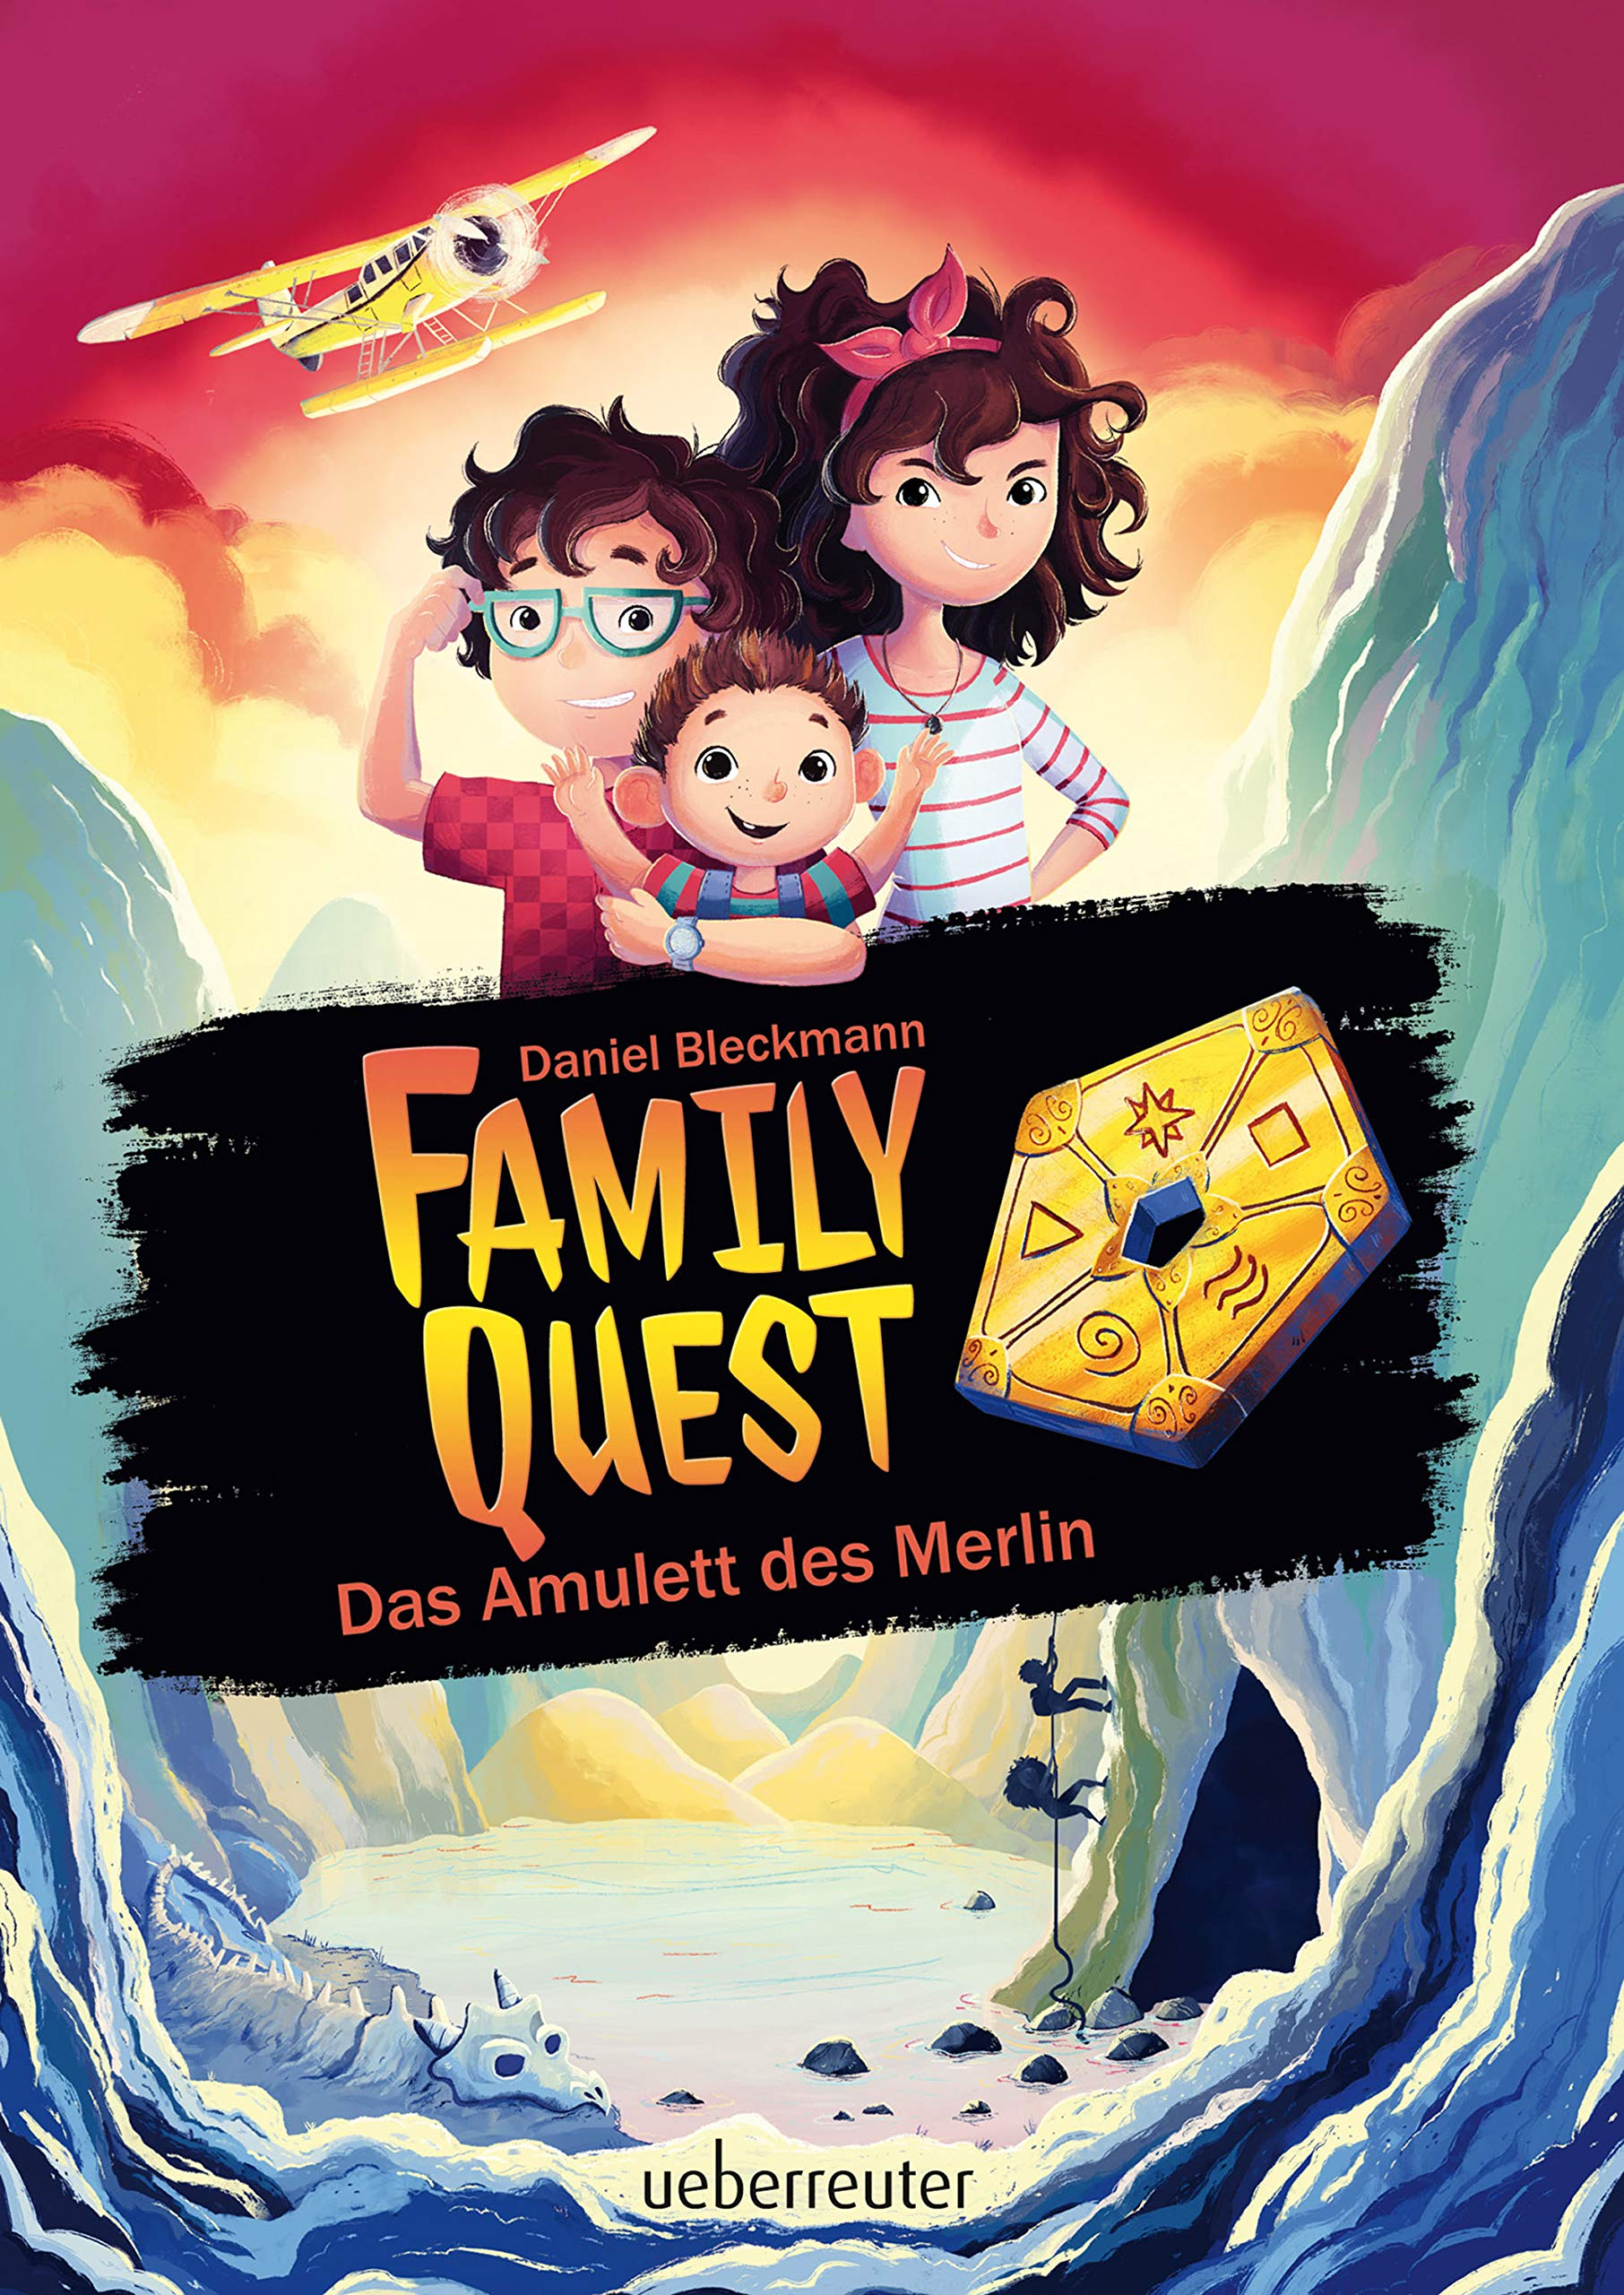 Family Quest: Das Amulett des Merlin